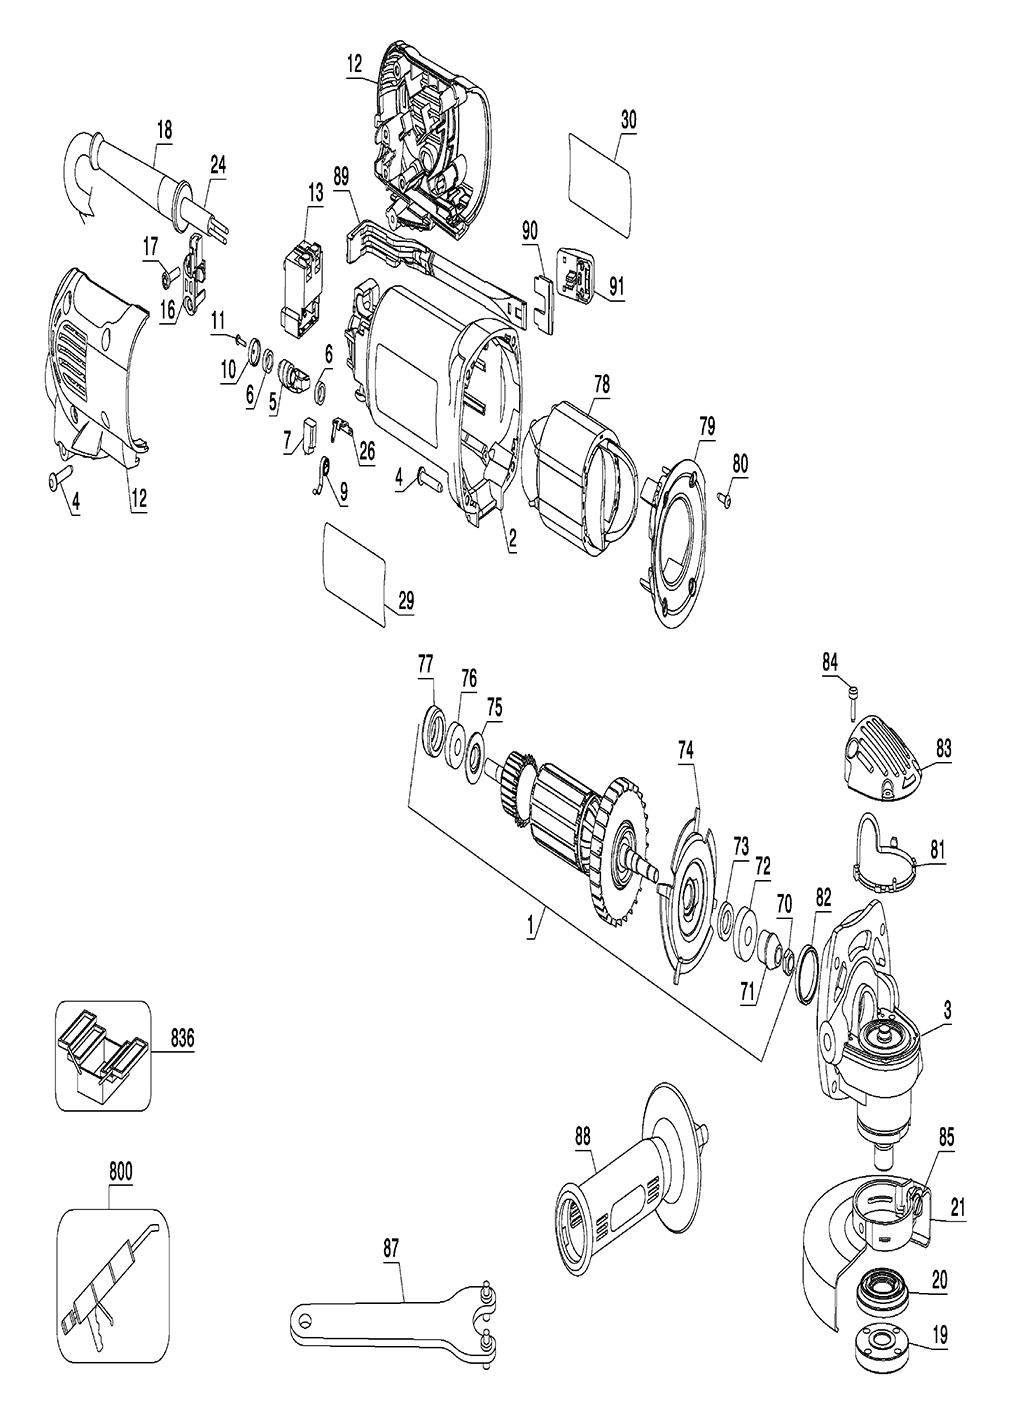 Buy Dewalt D28111-B3 Type-1 Replacement Tool Parts